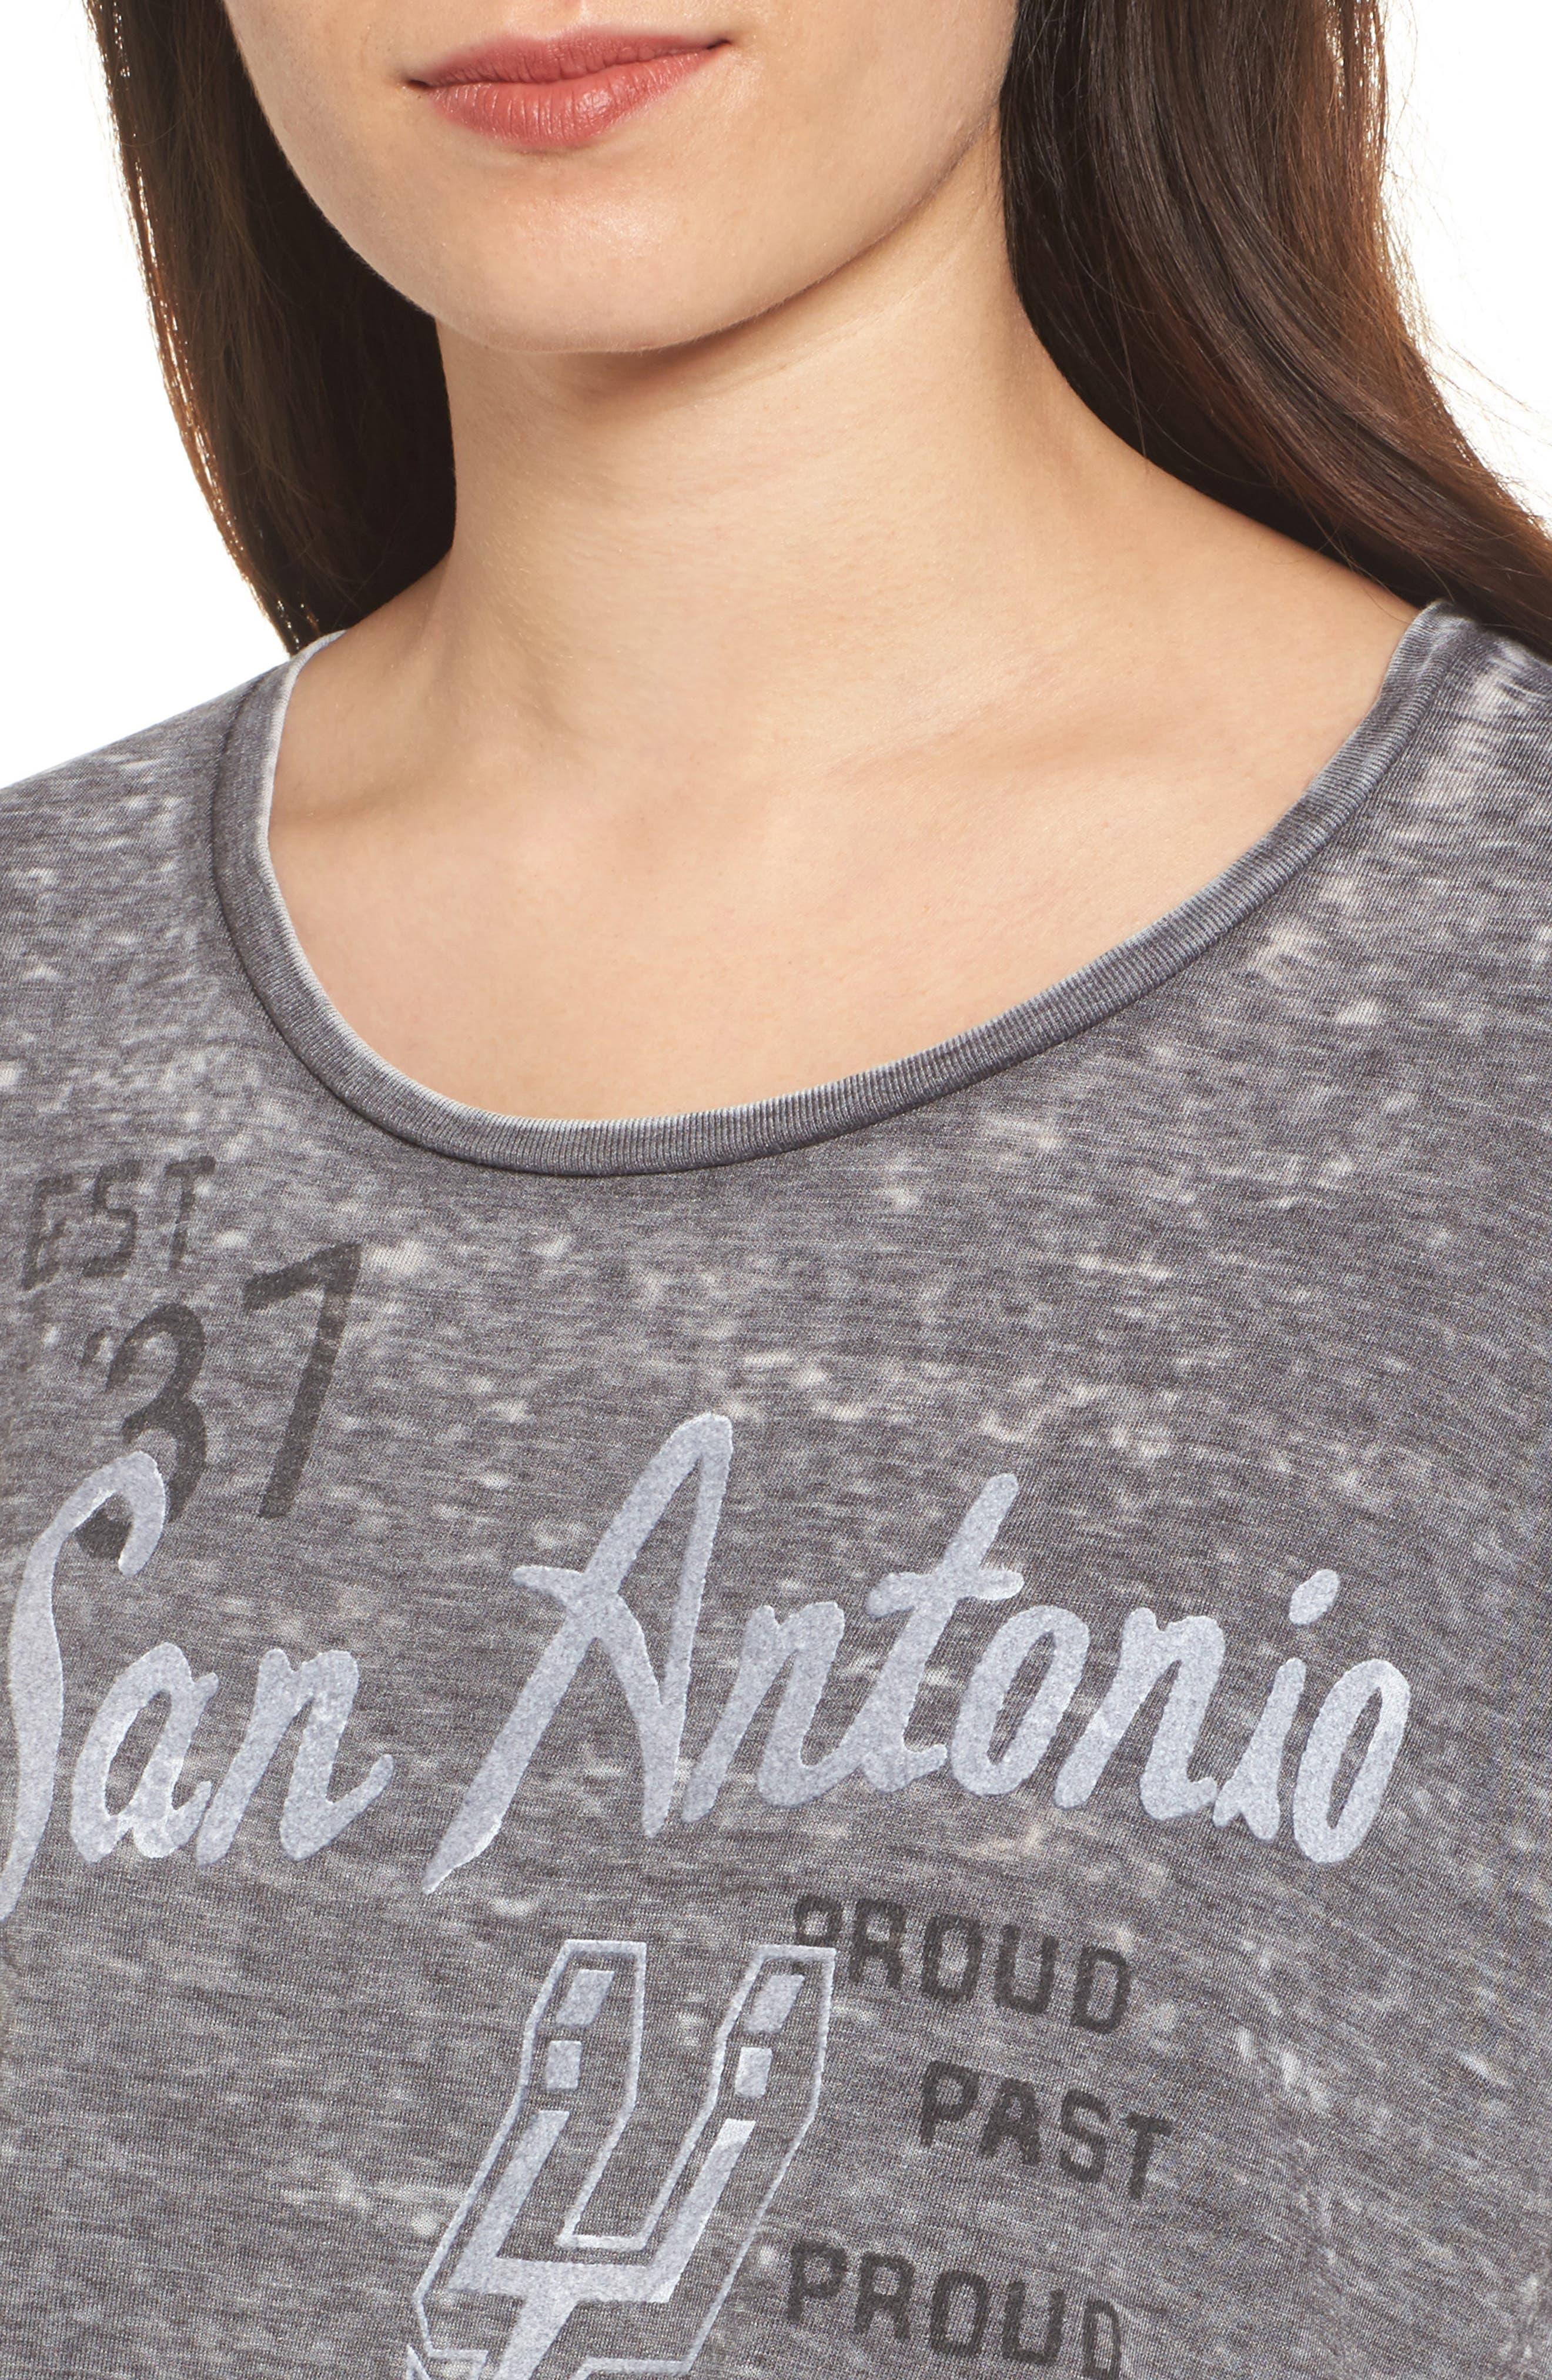 NBA San Antonio Spurs Tee,                             Alternate thumbnail 4, color,                             004